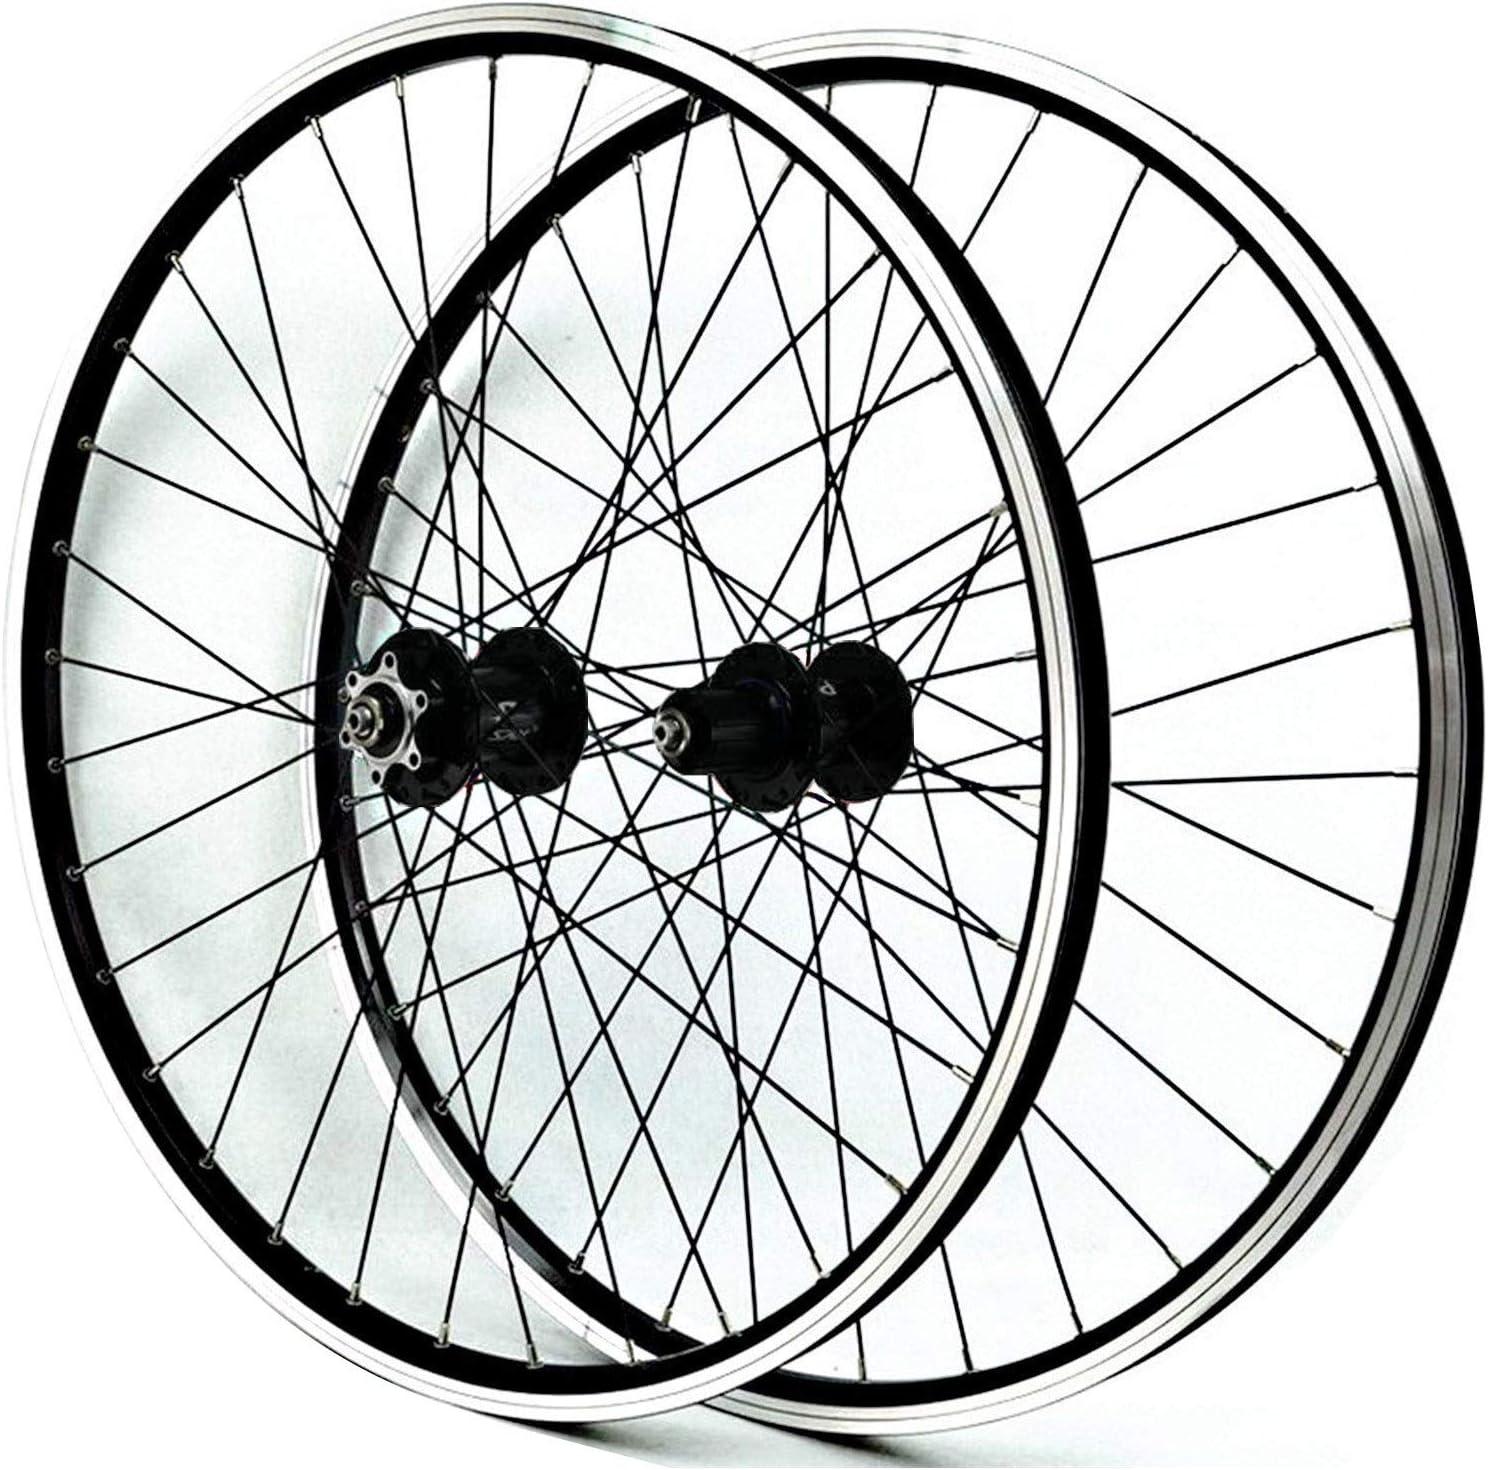 ZNND Juego Ruedas Bicicleta Montaña 26 Pulgadas Pared Doble Aluminio Freno De Disco/V Ruedas BTT Bici Frente 2 Trasero 4 Palin 32 Hoyos 7-11 Velocidades